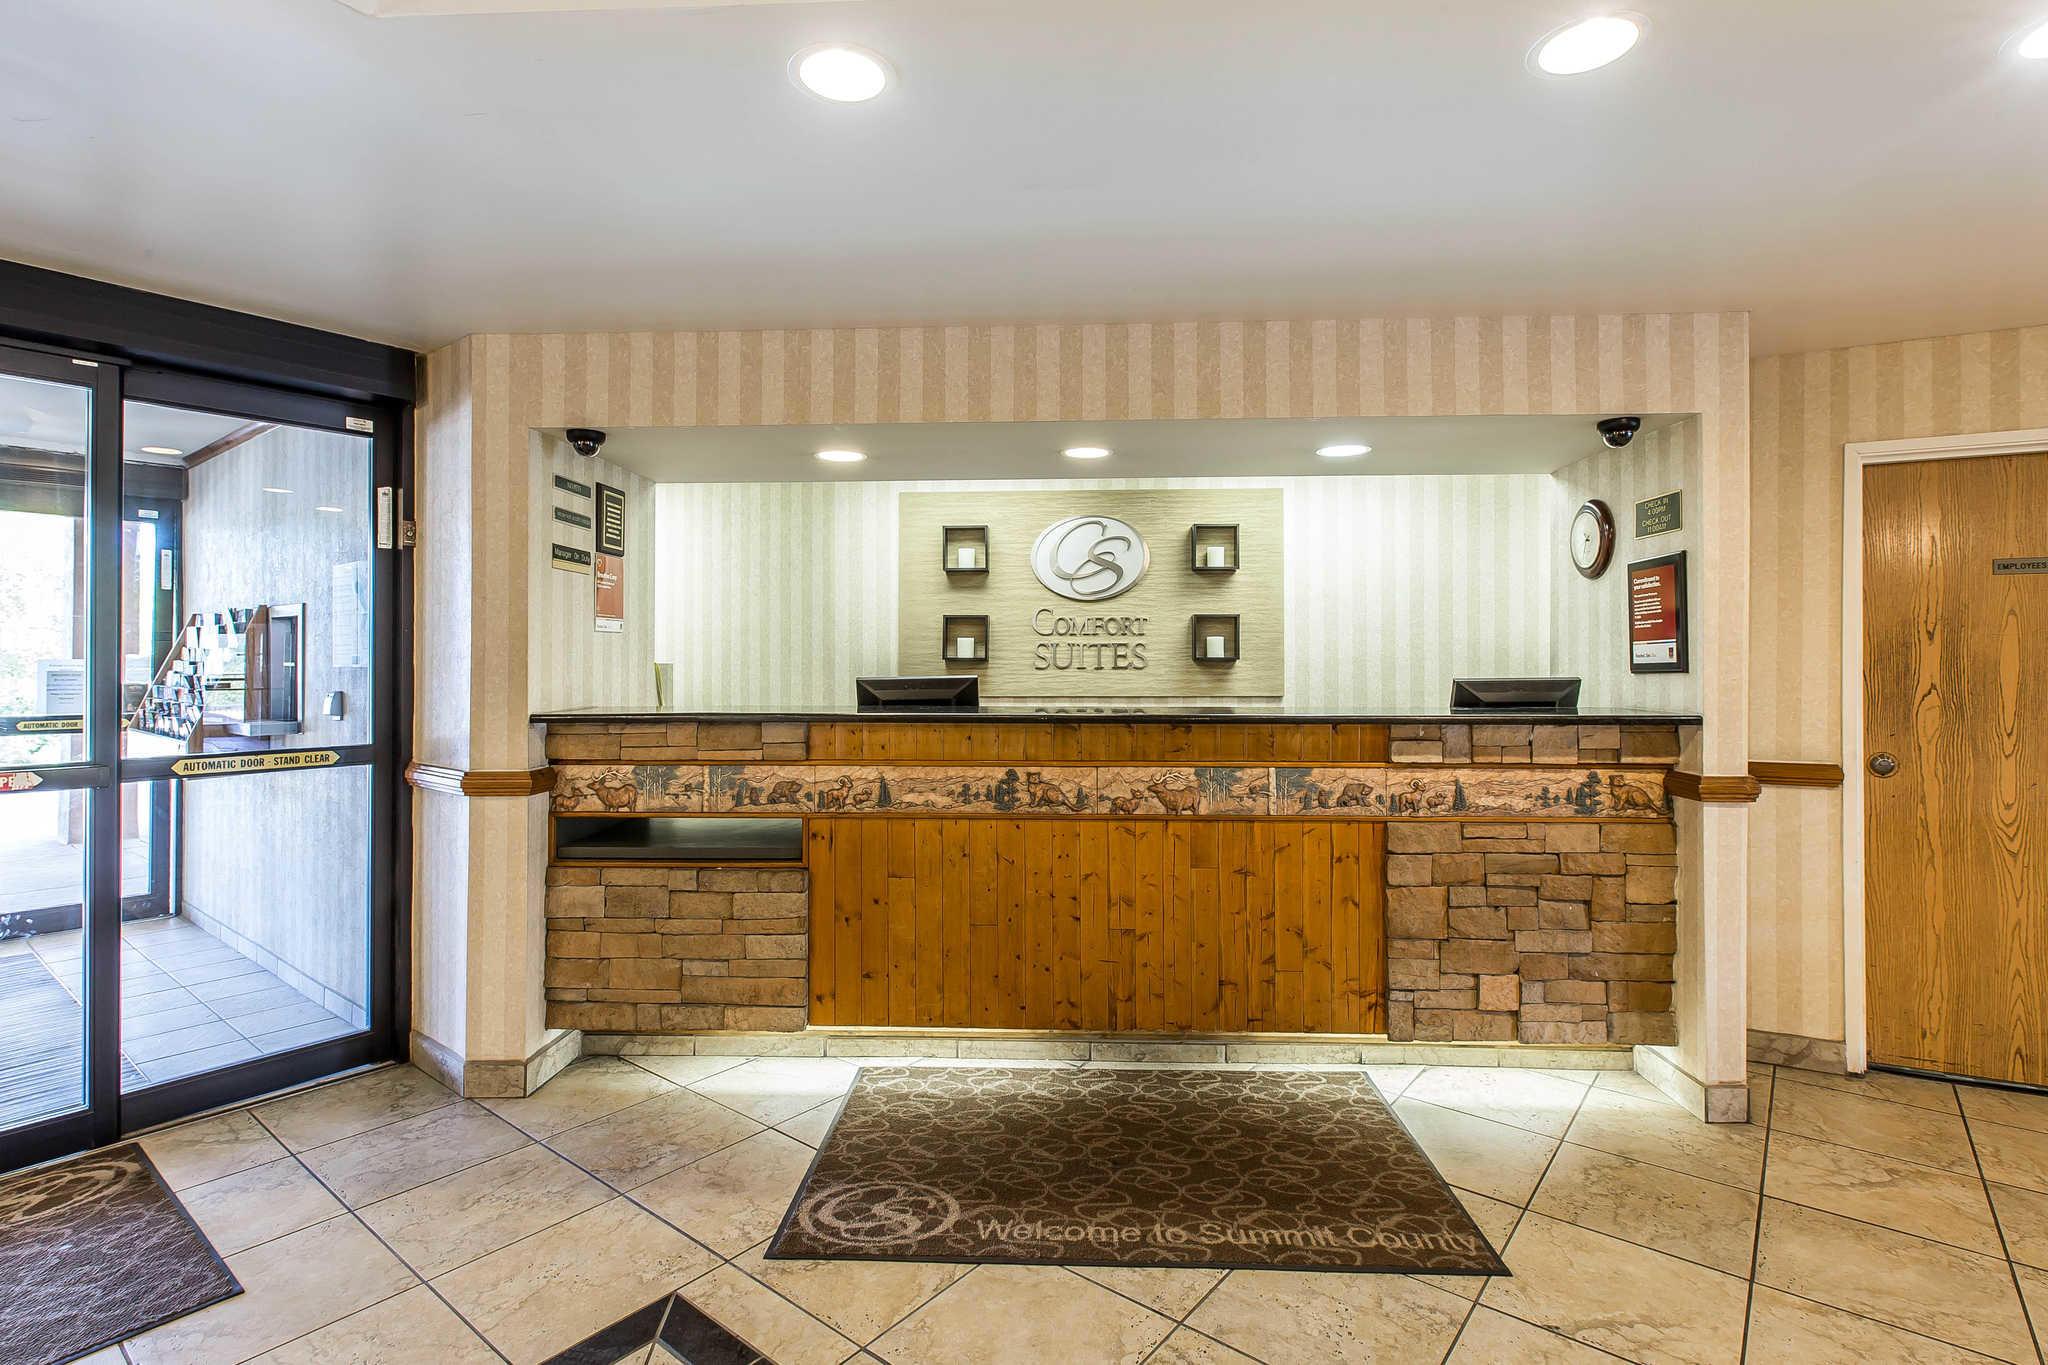 Comfort Suites Summit County image 2